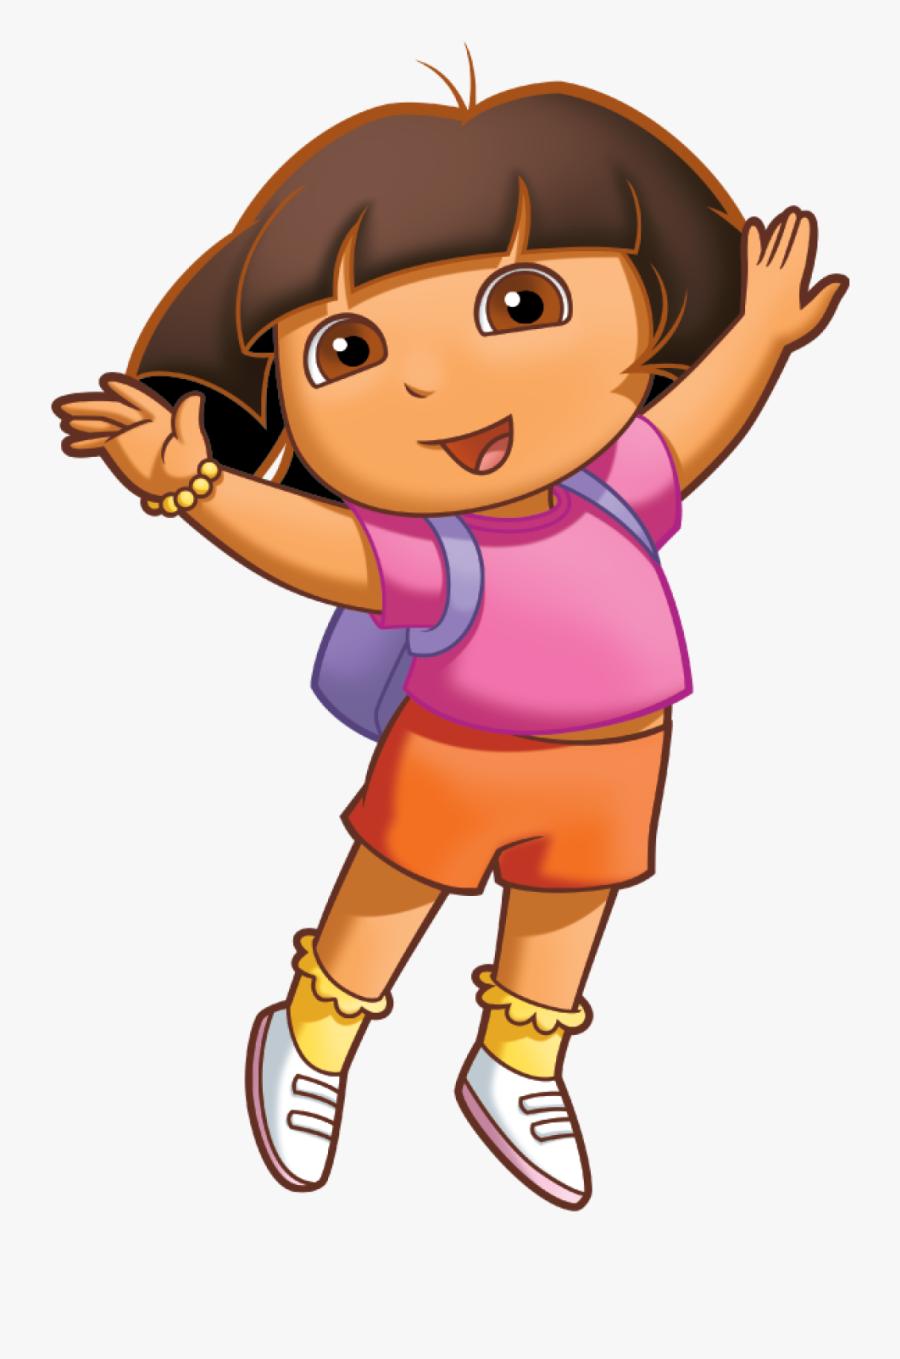 Transparent Explorer Person Clipart - Dora The Explorer, Transparent Clipart